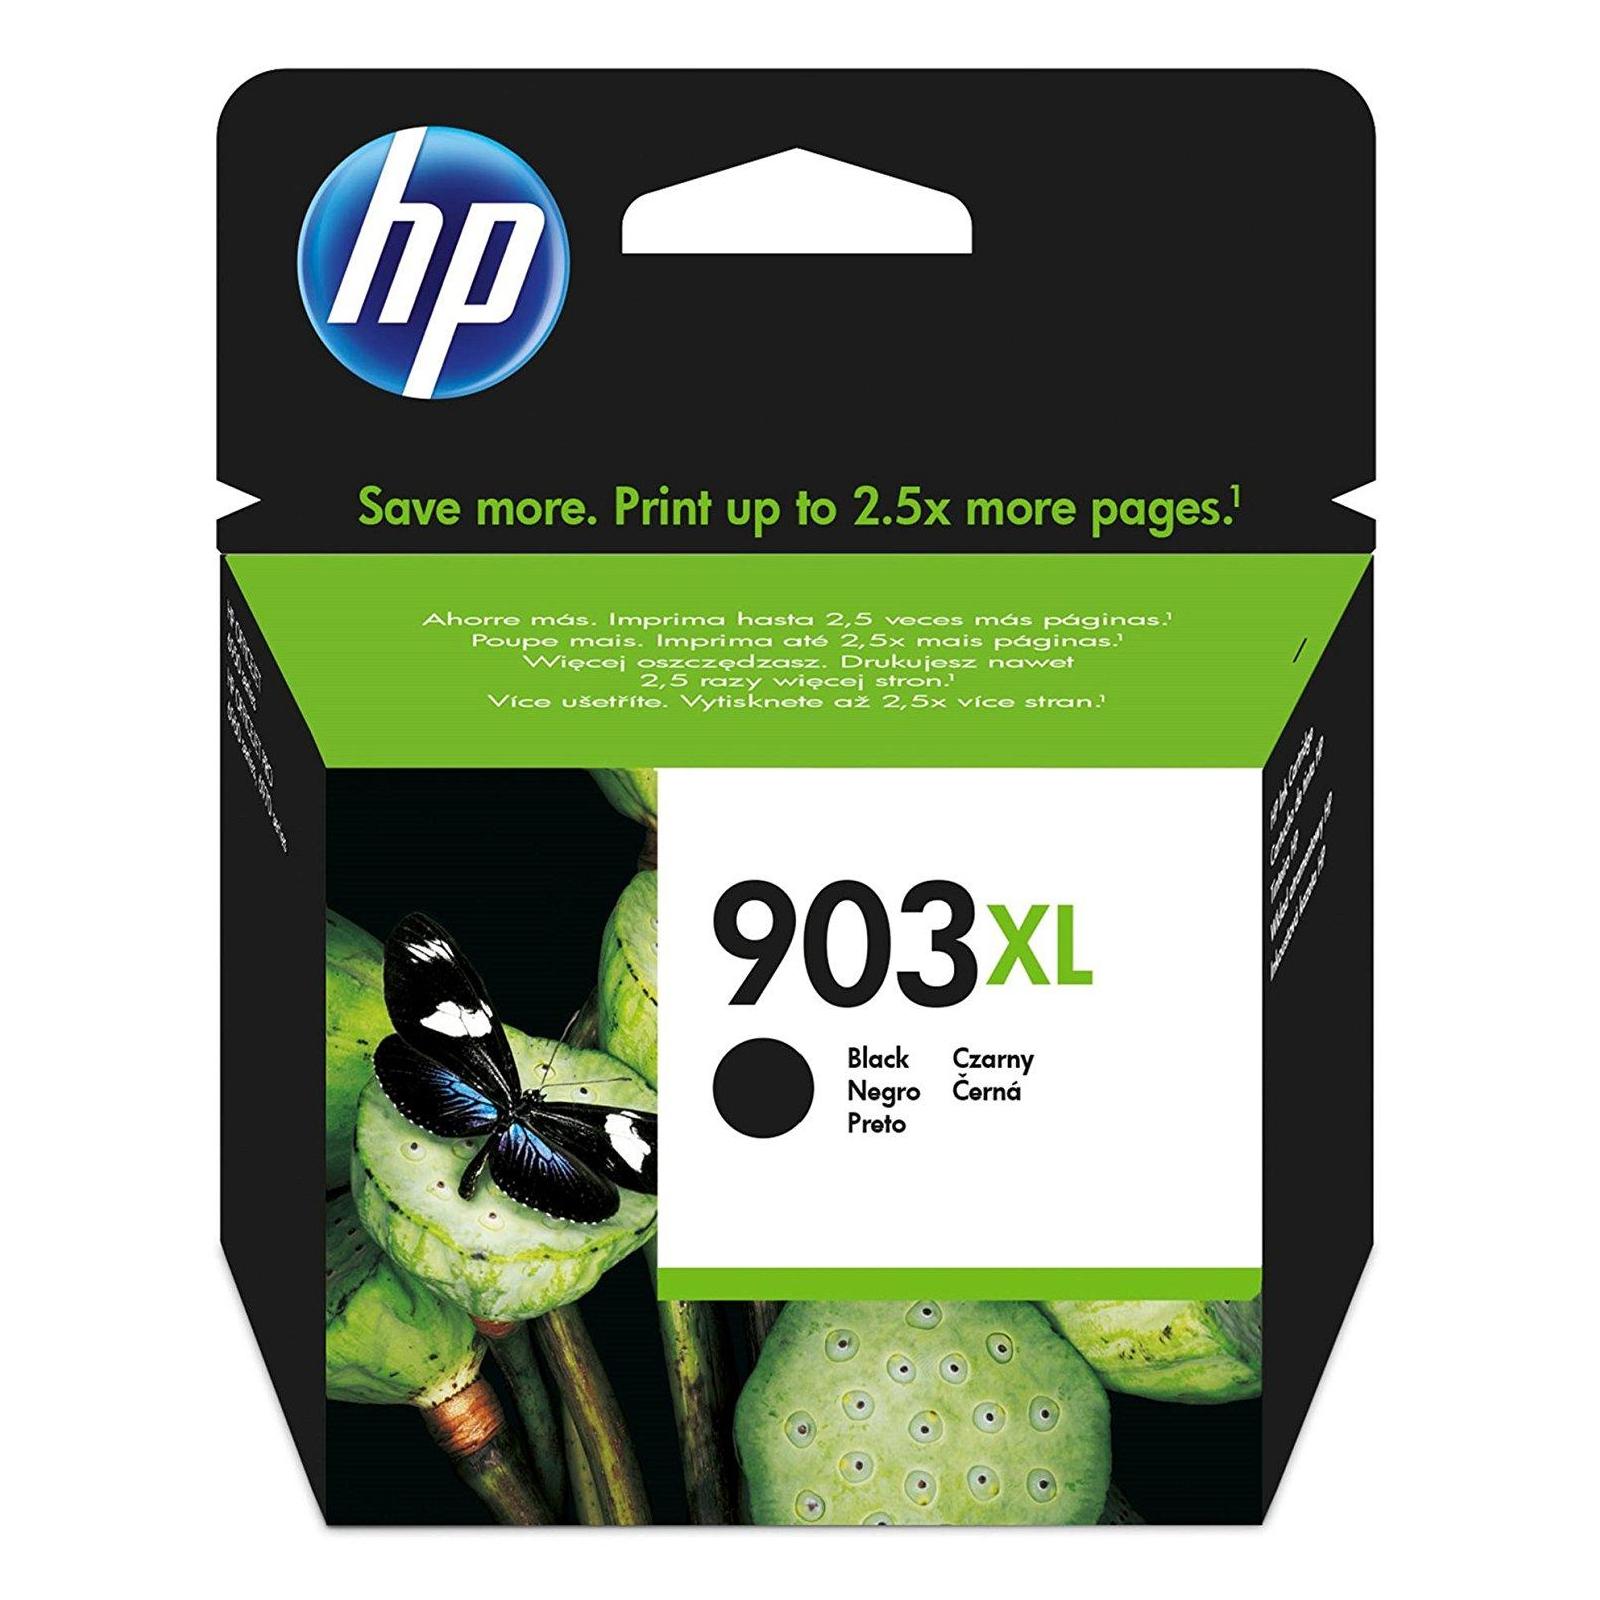 Картридж HP DJ No.903XL Black, OfficeJet 6950/6960/6970 (T6M15AE)